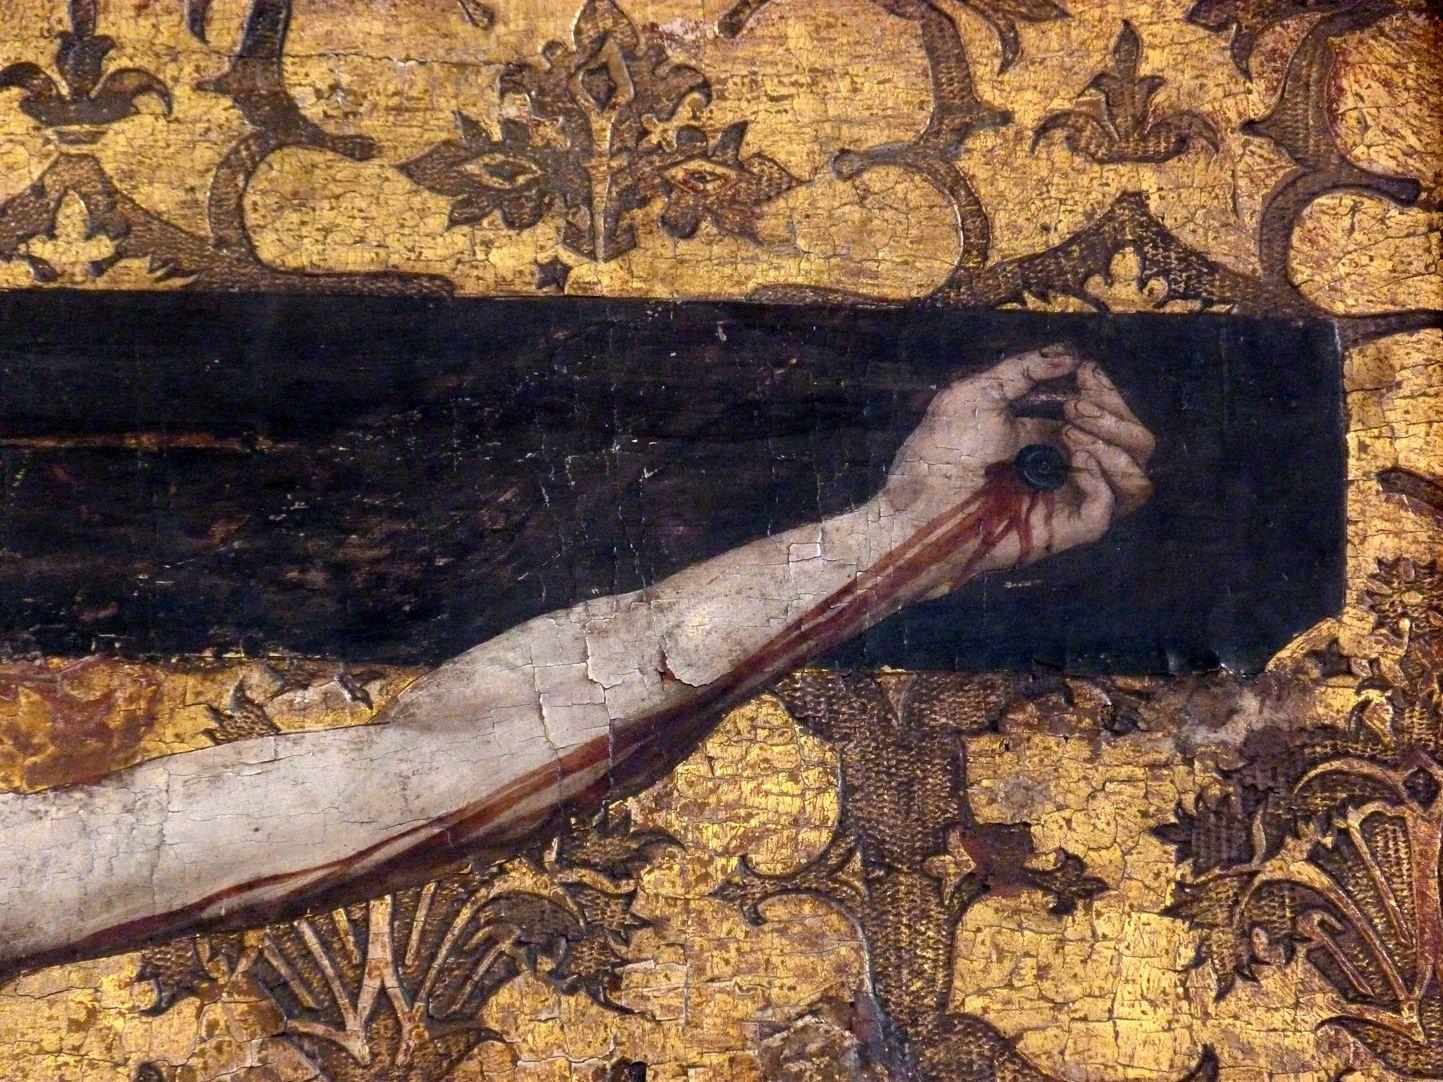 Epitaph der Obernitz Der Gekreuzigte, linker Arm